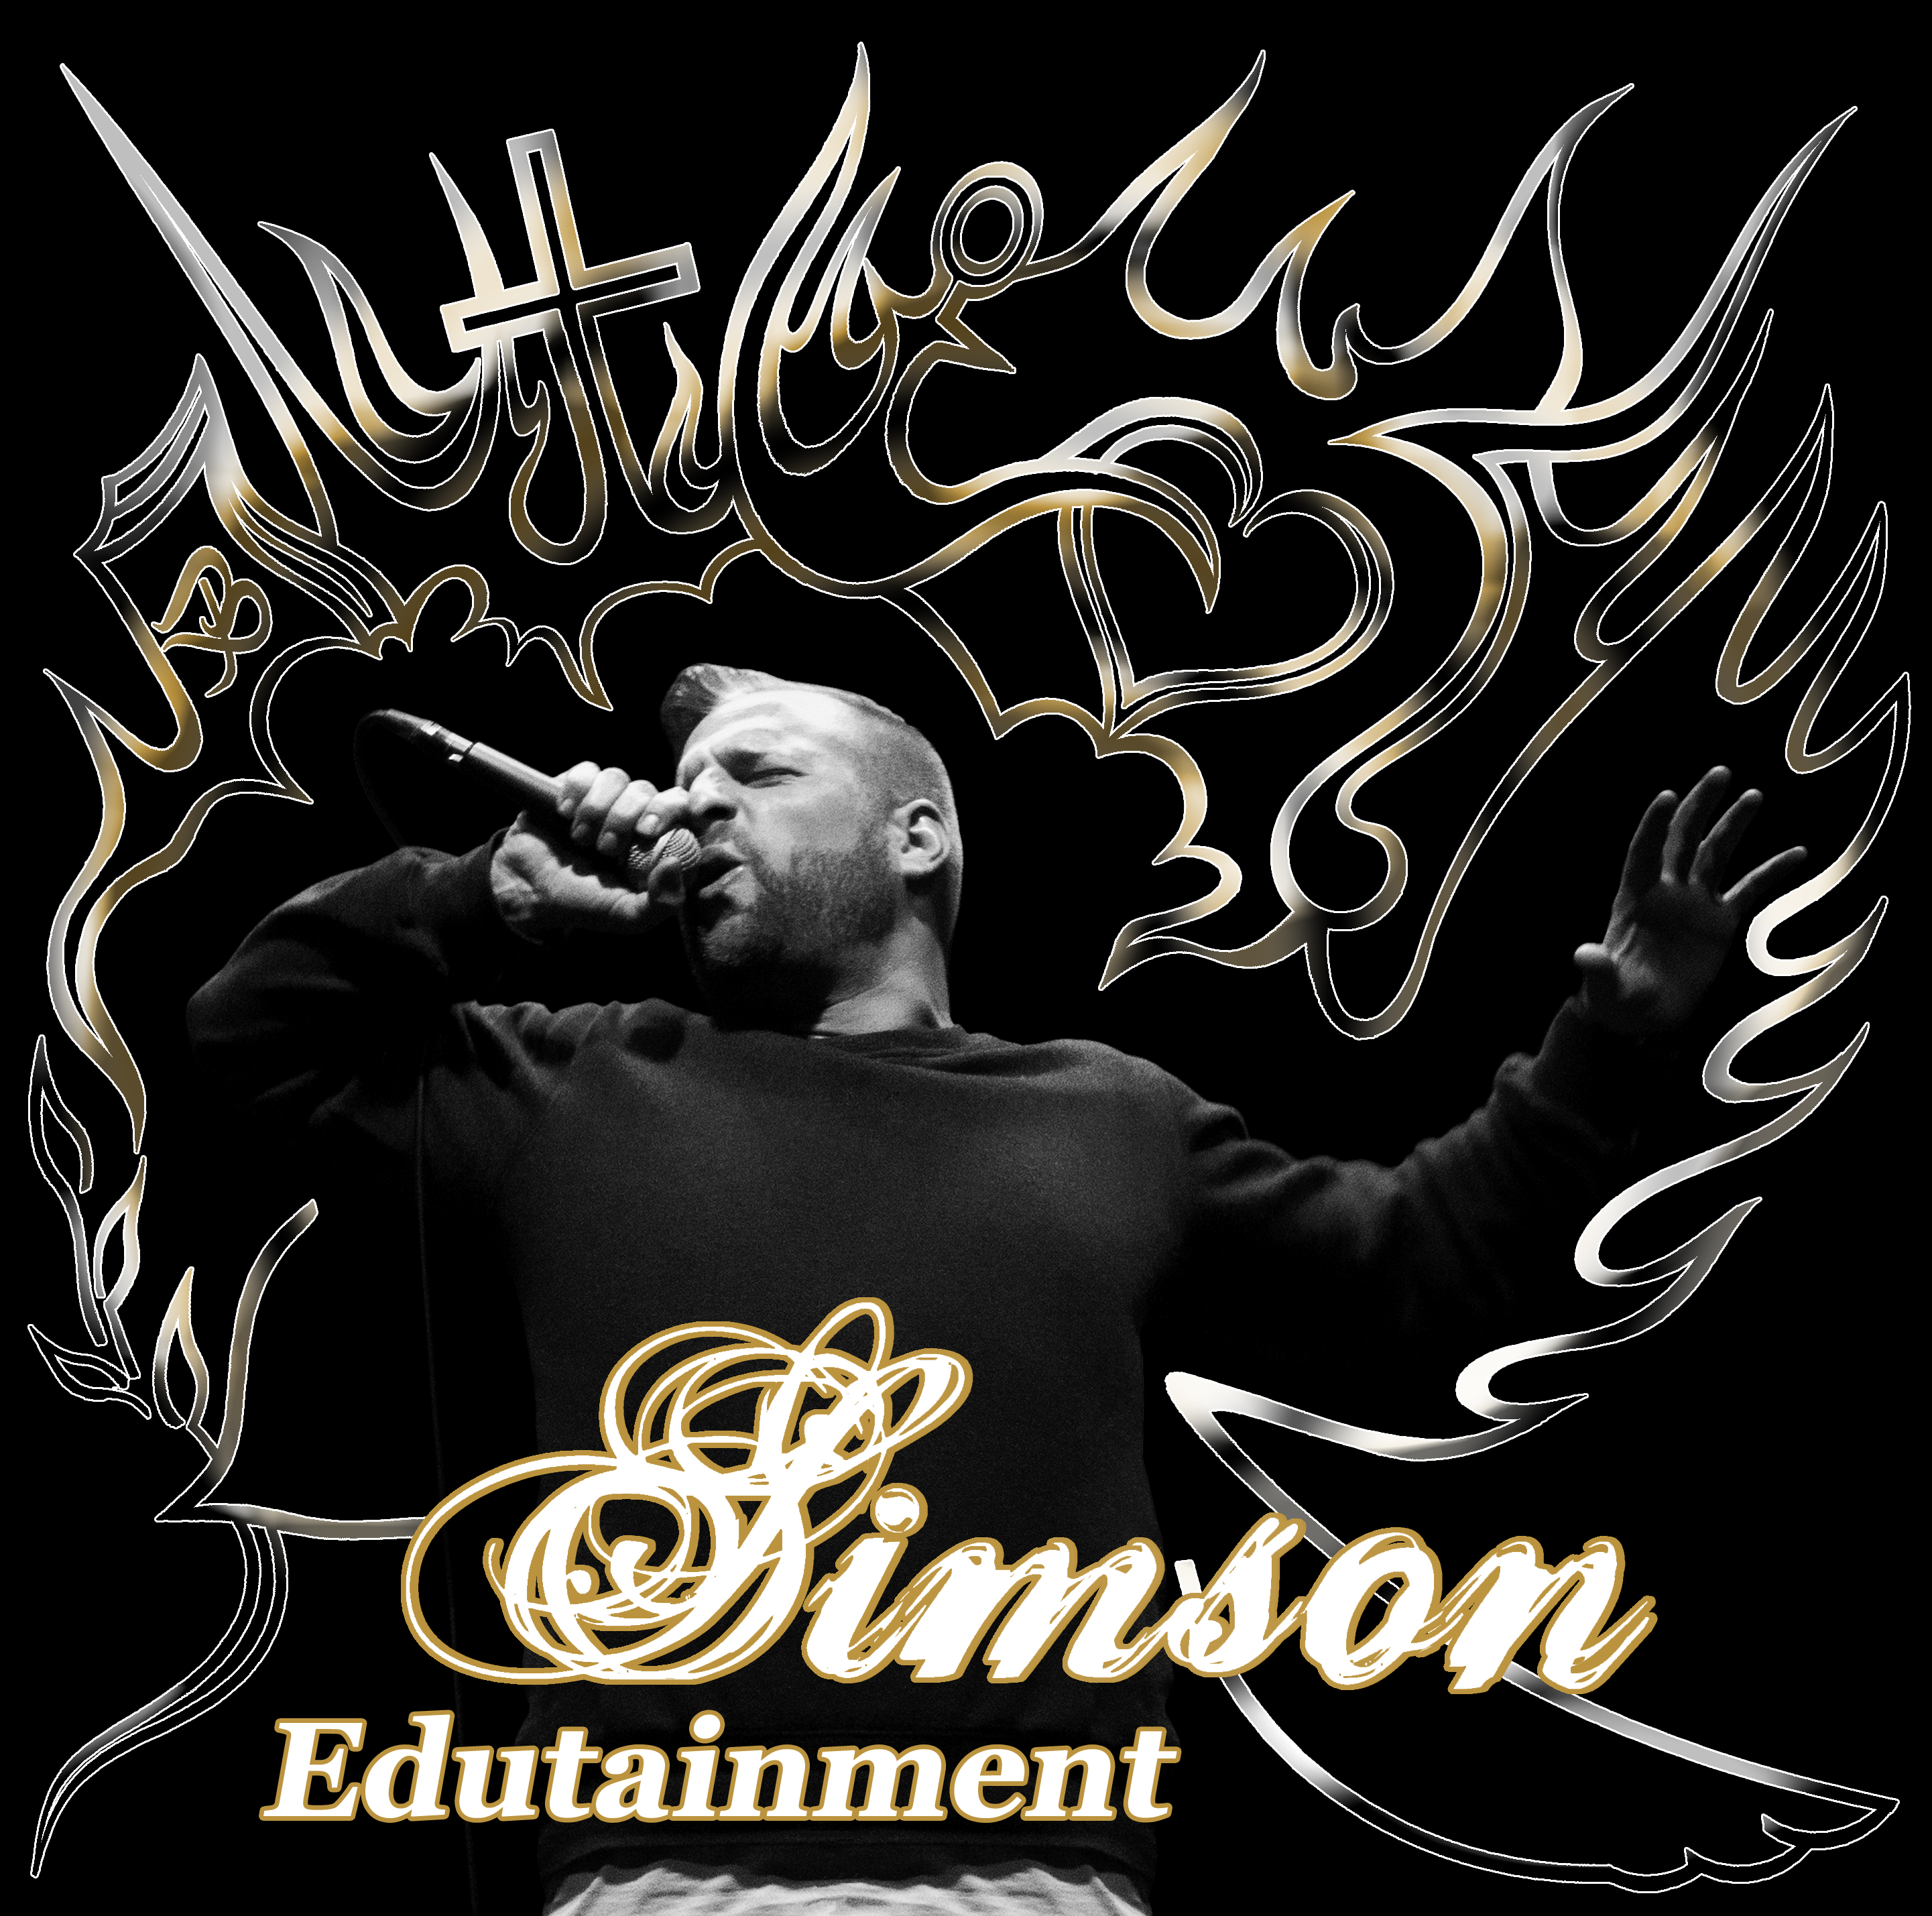 Simson - Edutainment - Front